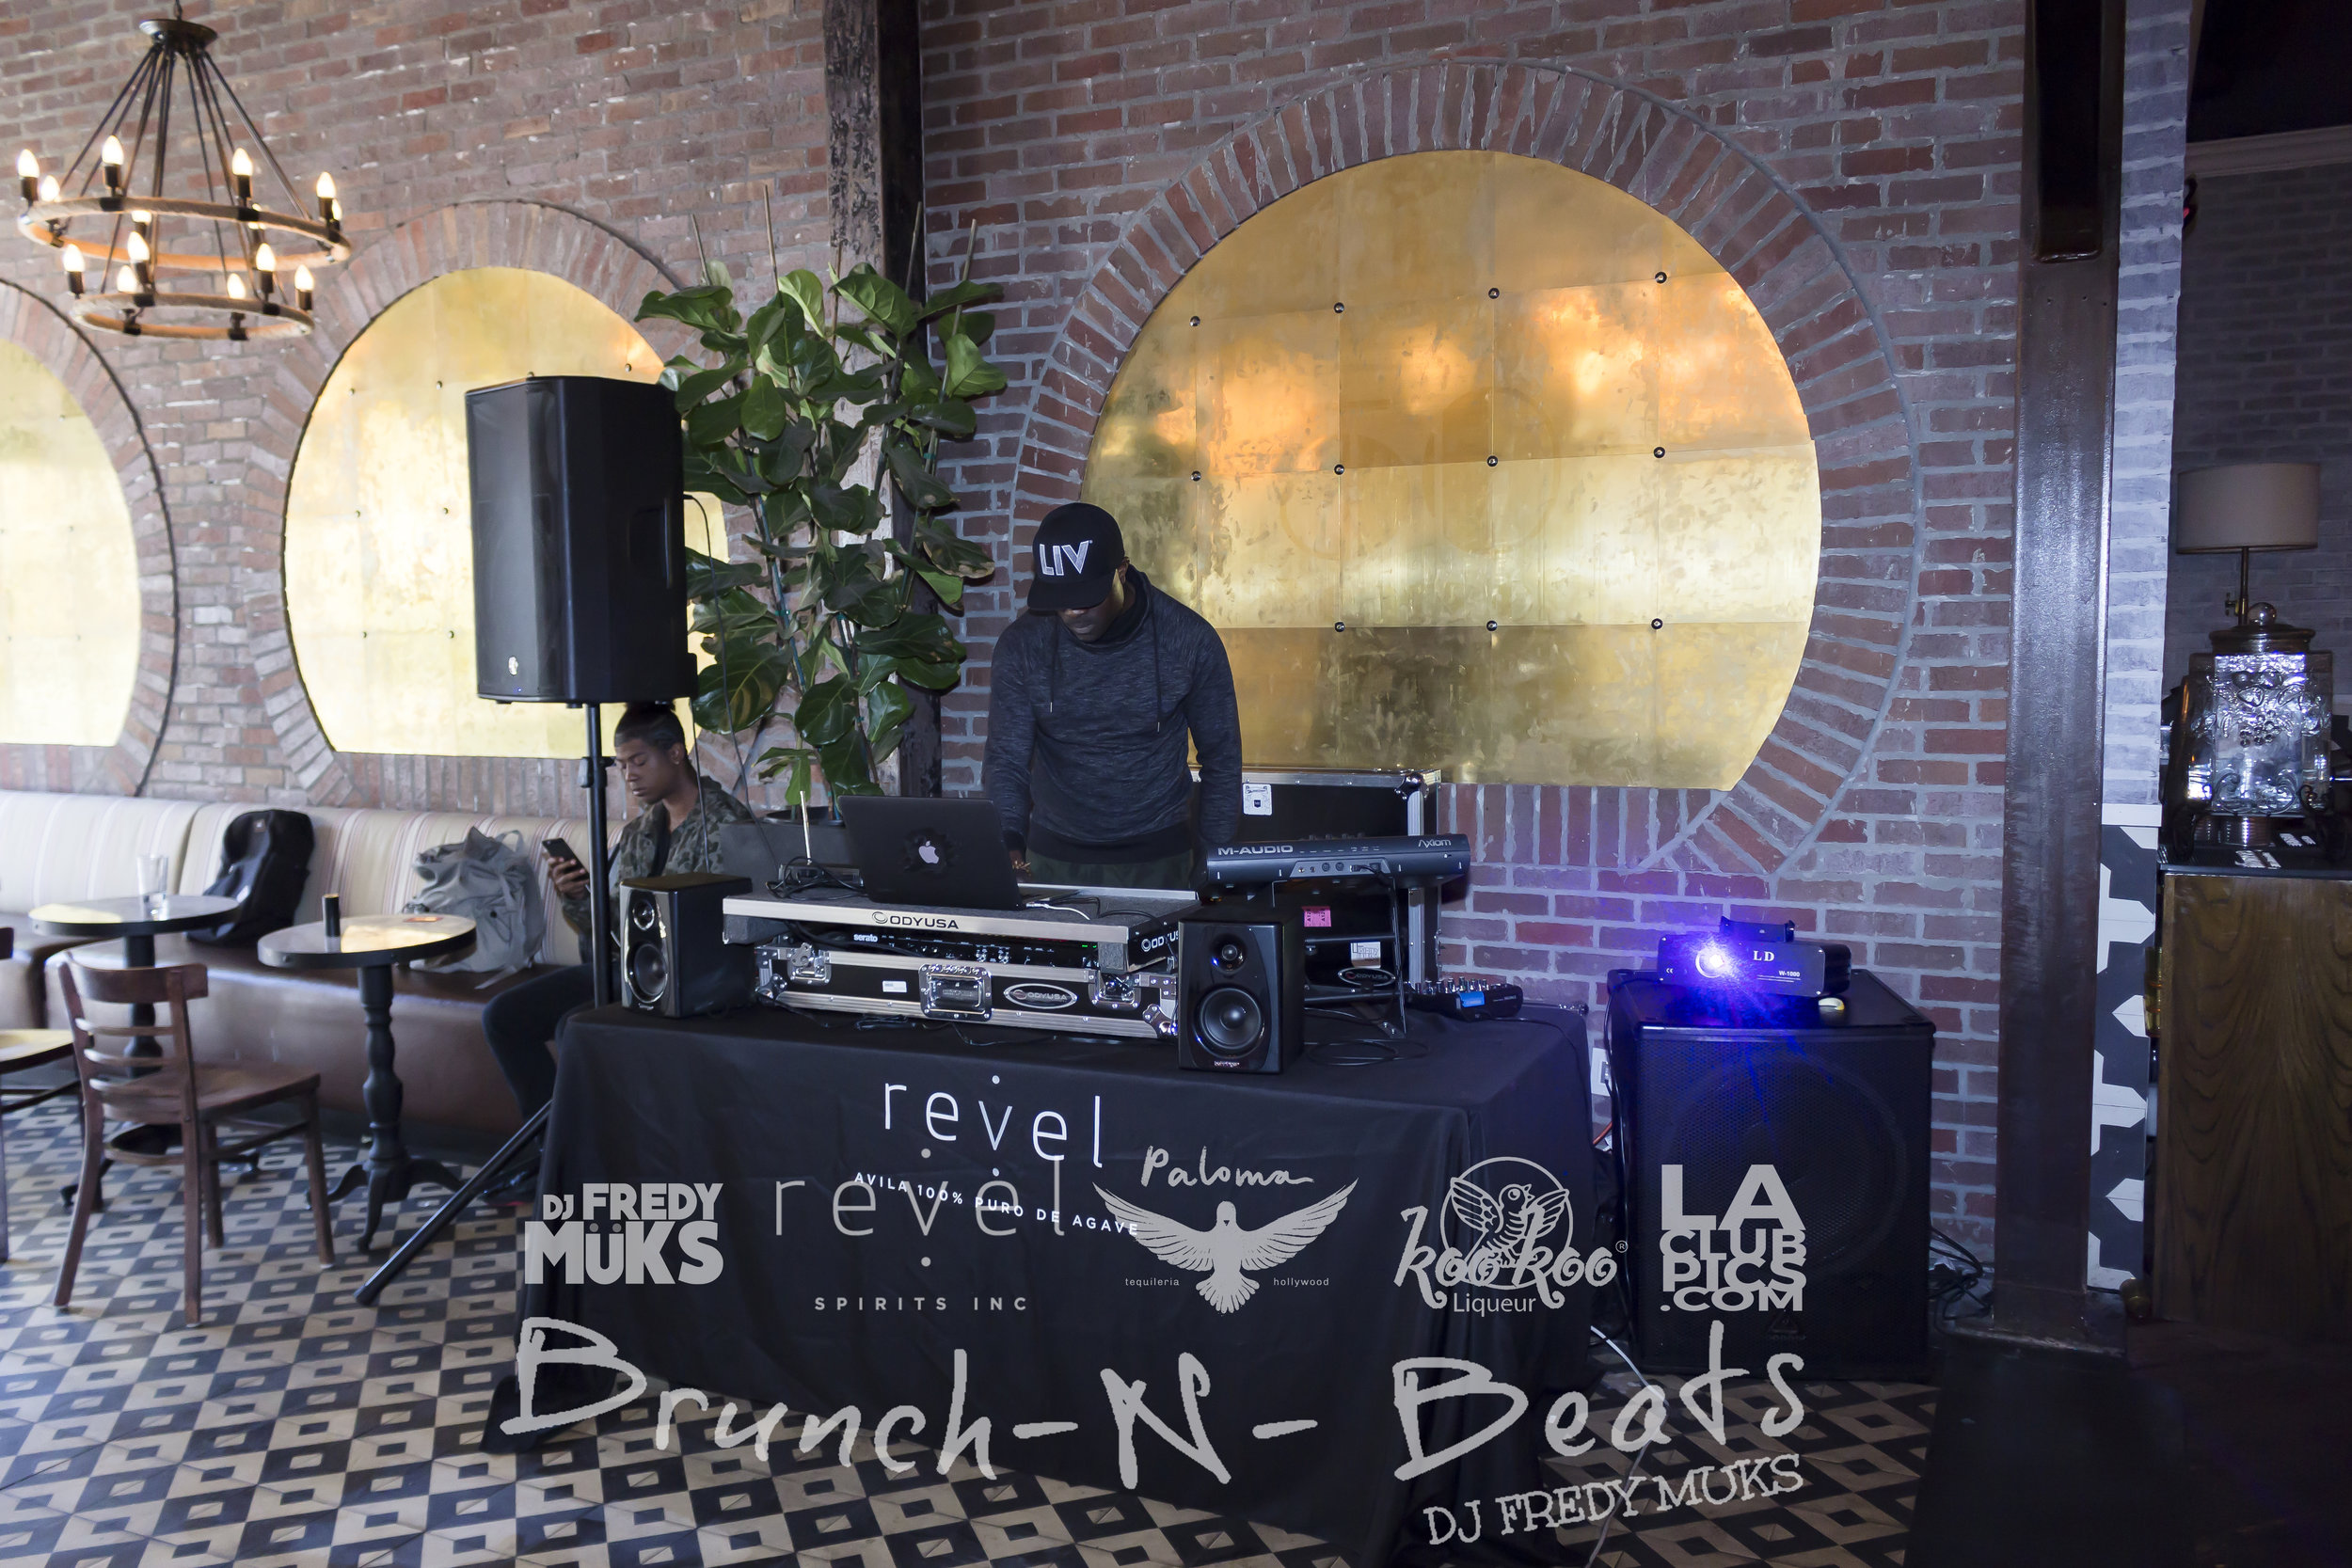 Brunch-N-Beats - Paloma Hollywood - 02-25-18_4.jpg